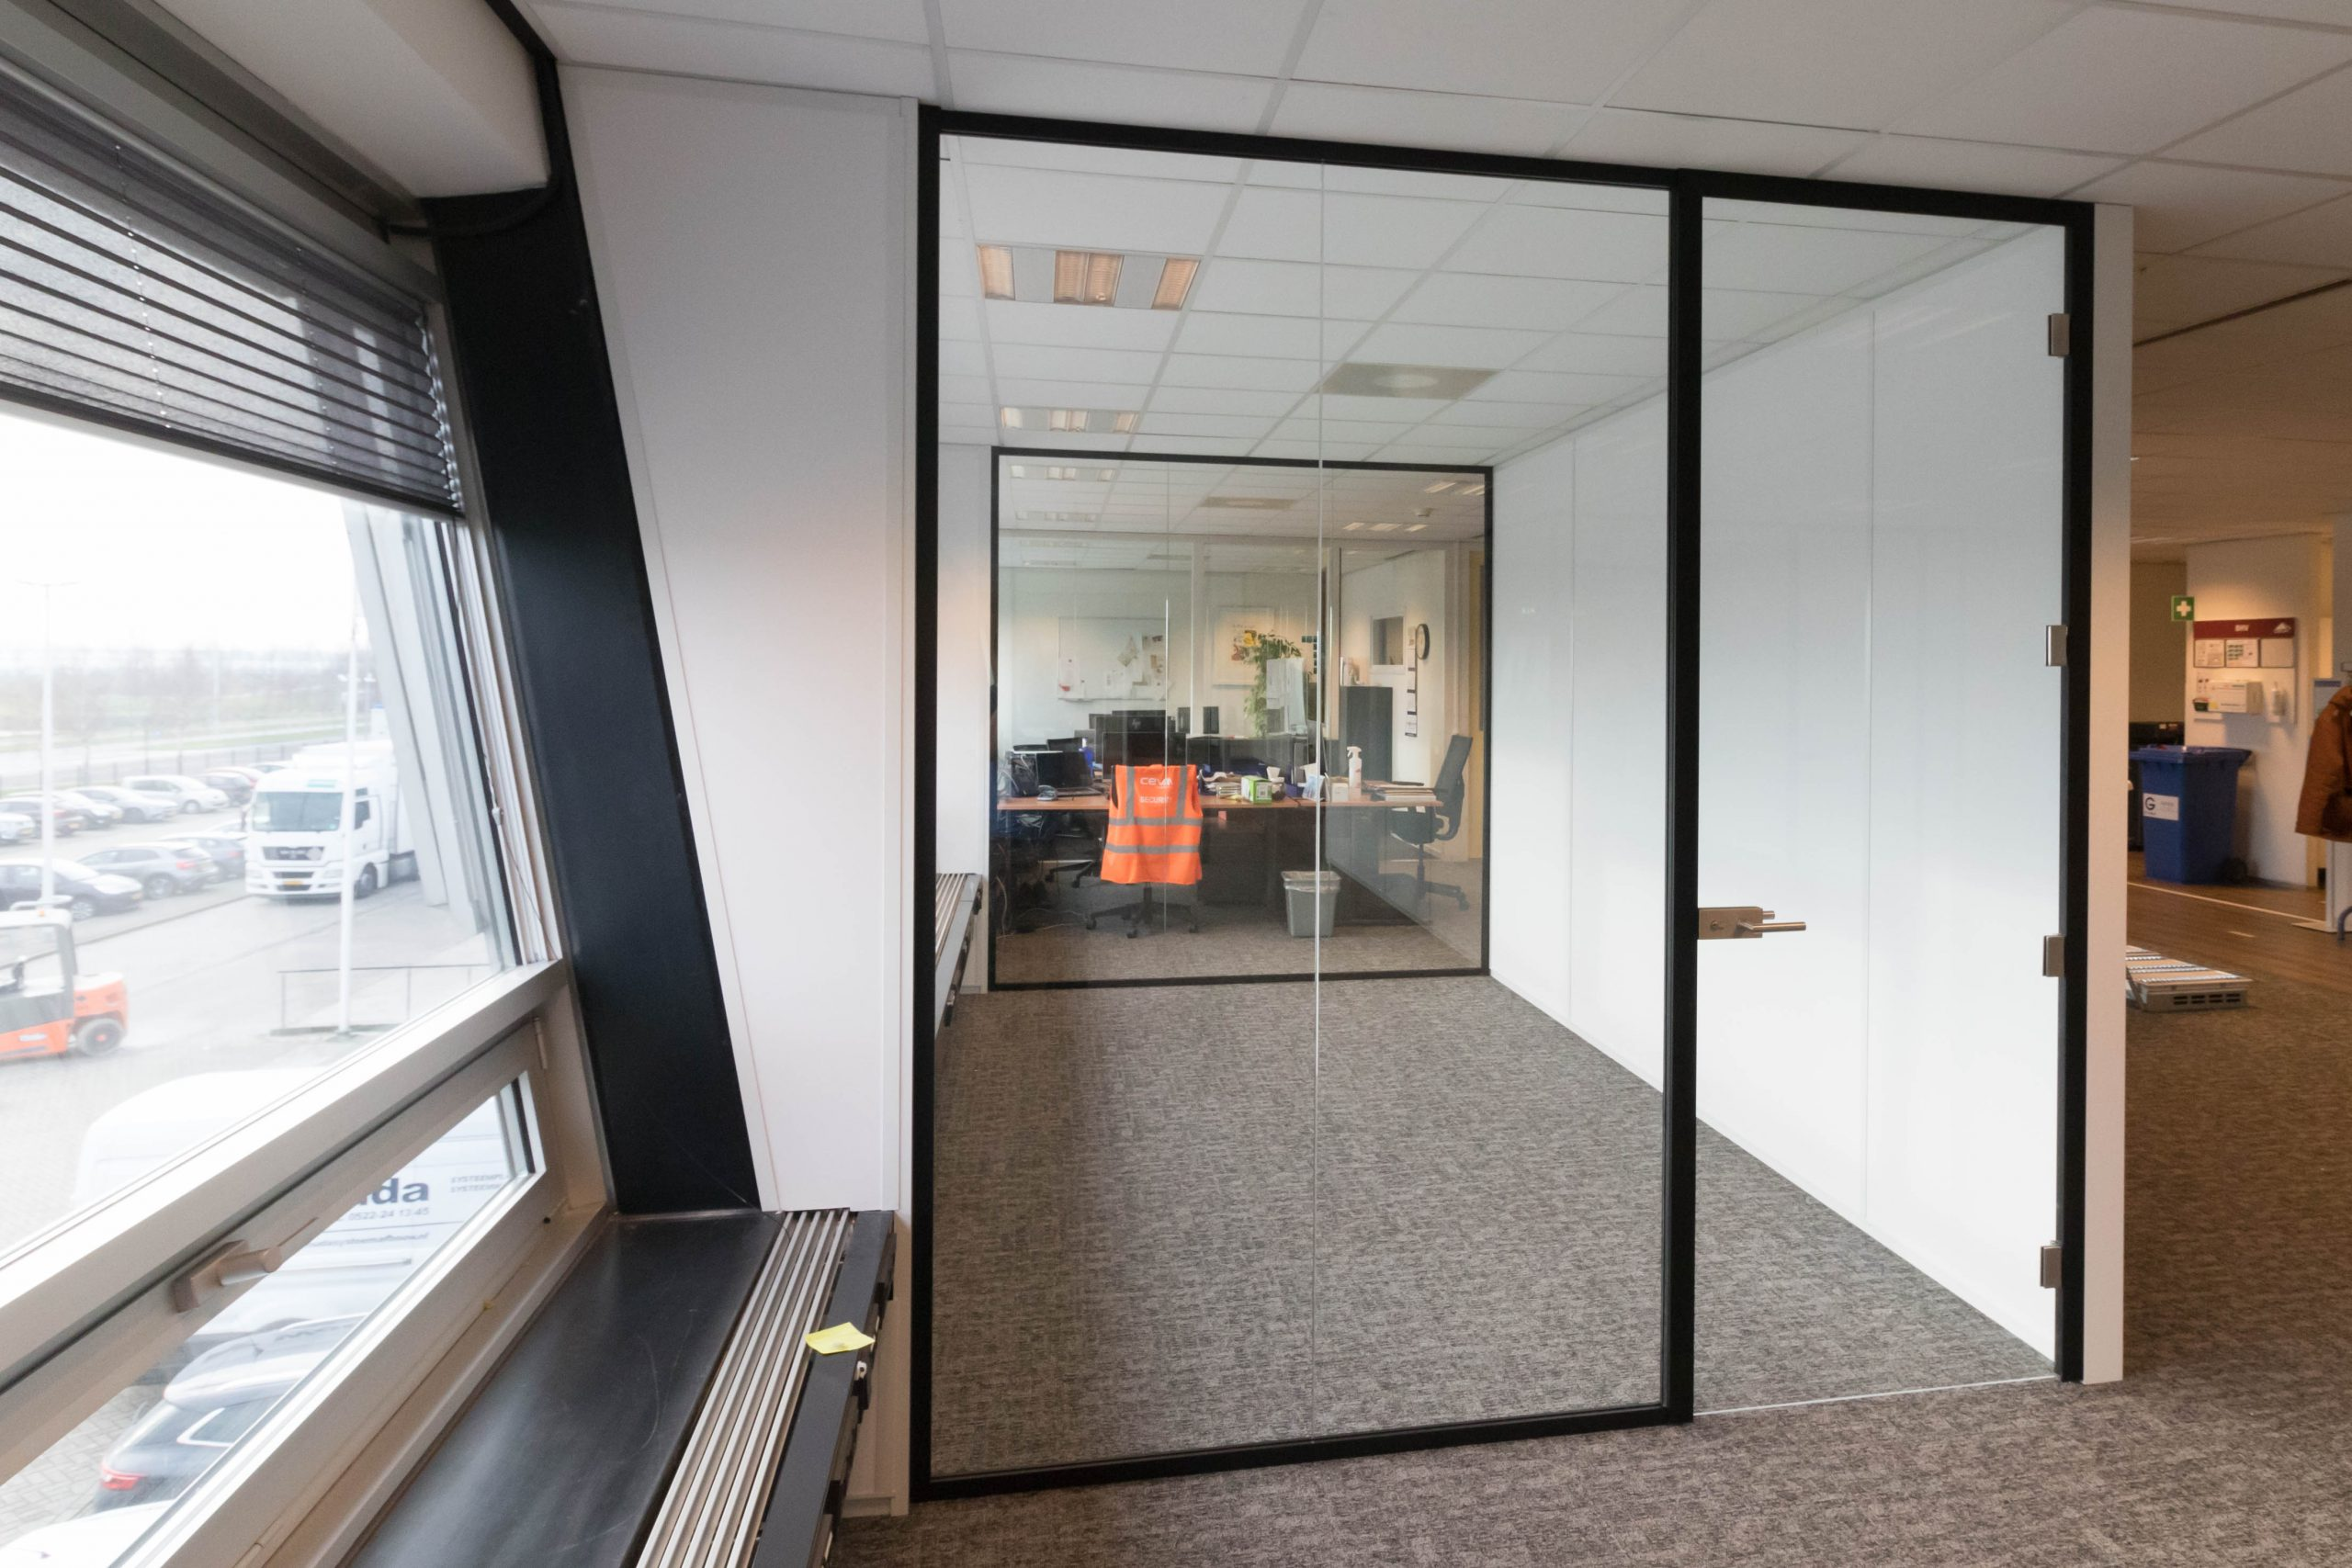 Ceva Freight Holland Schiphol gallery